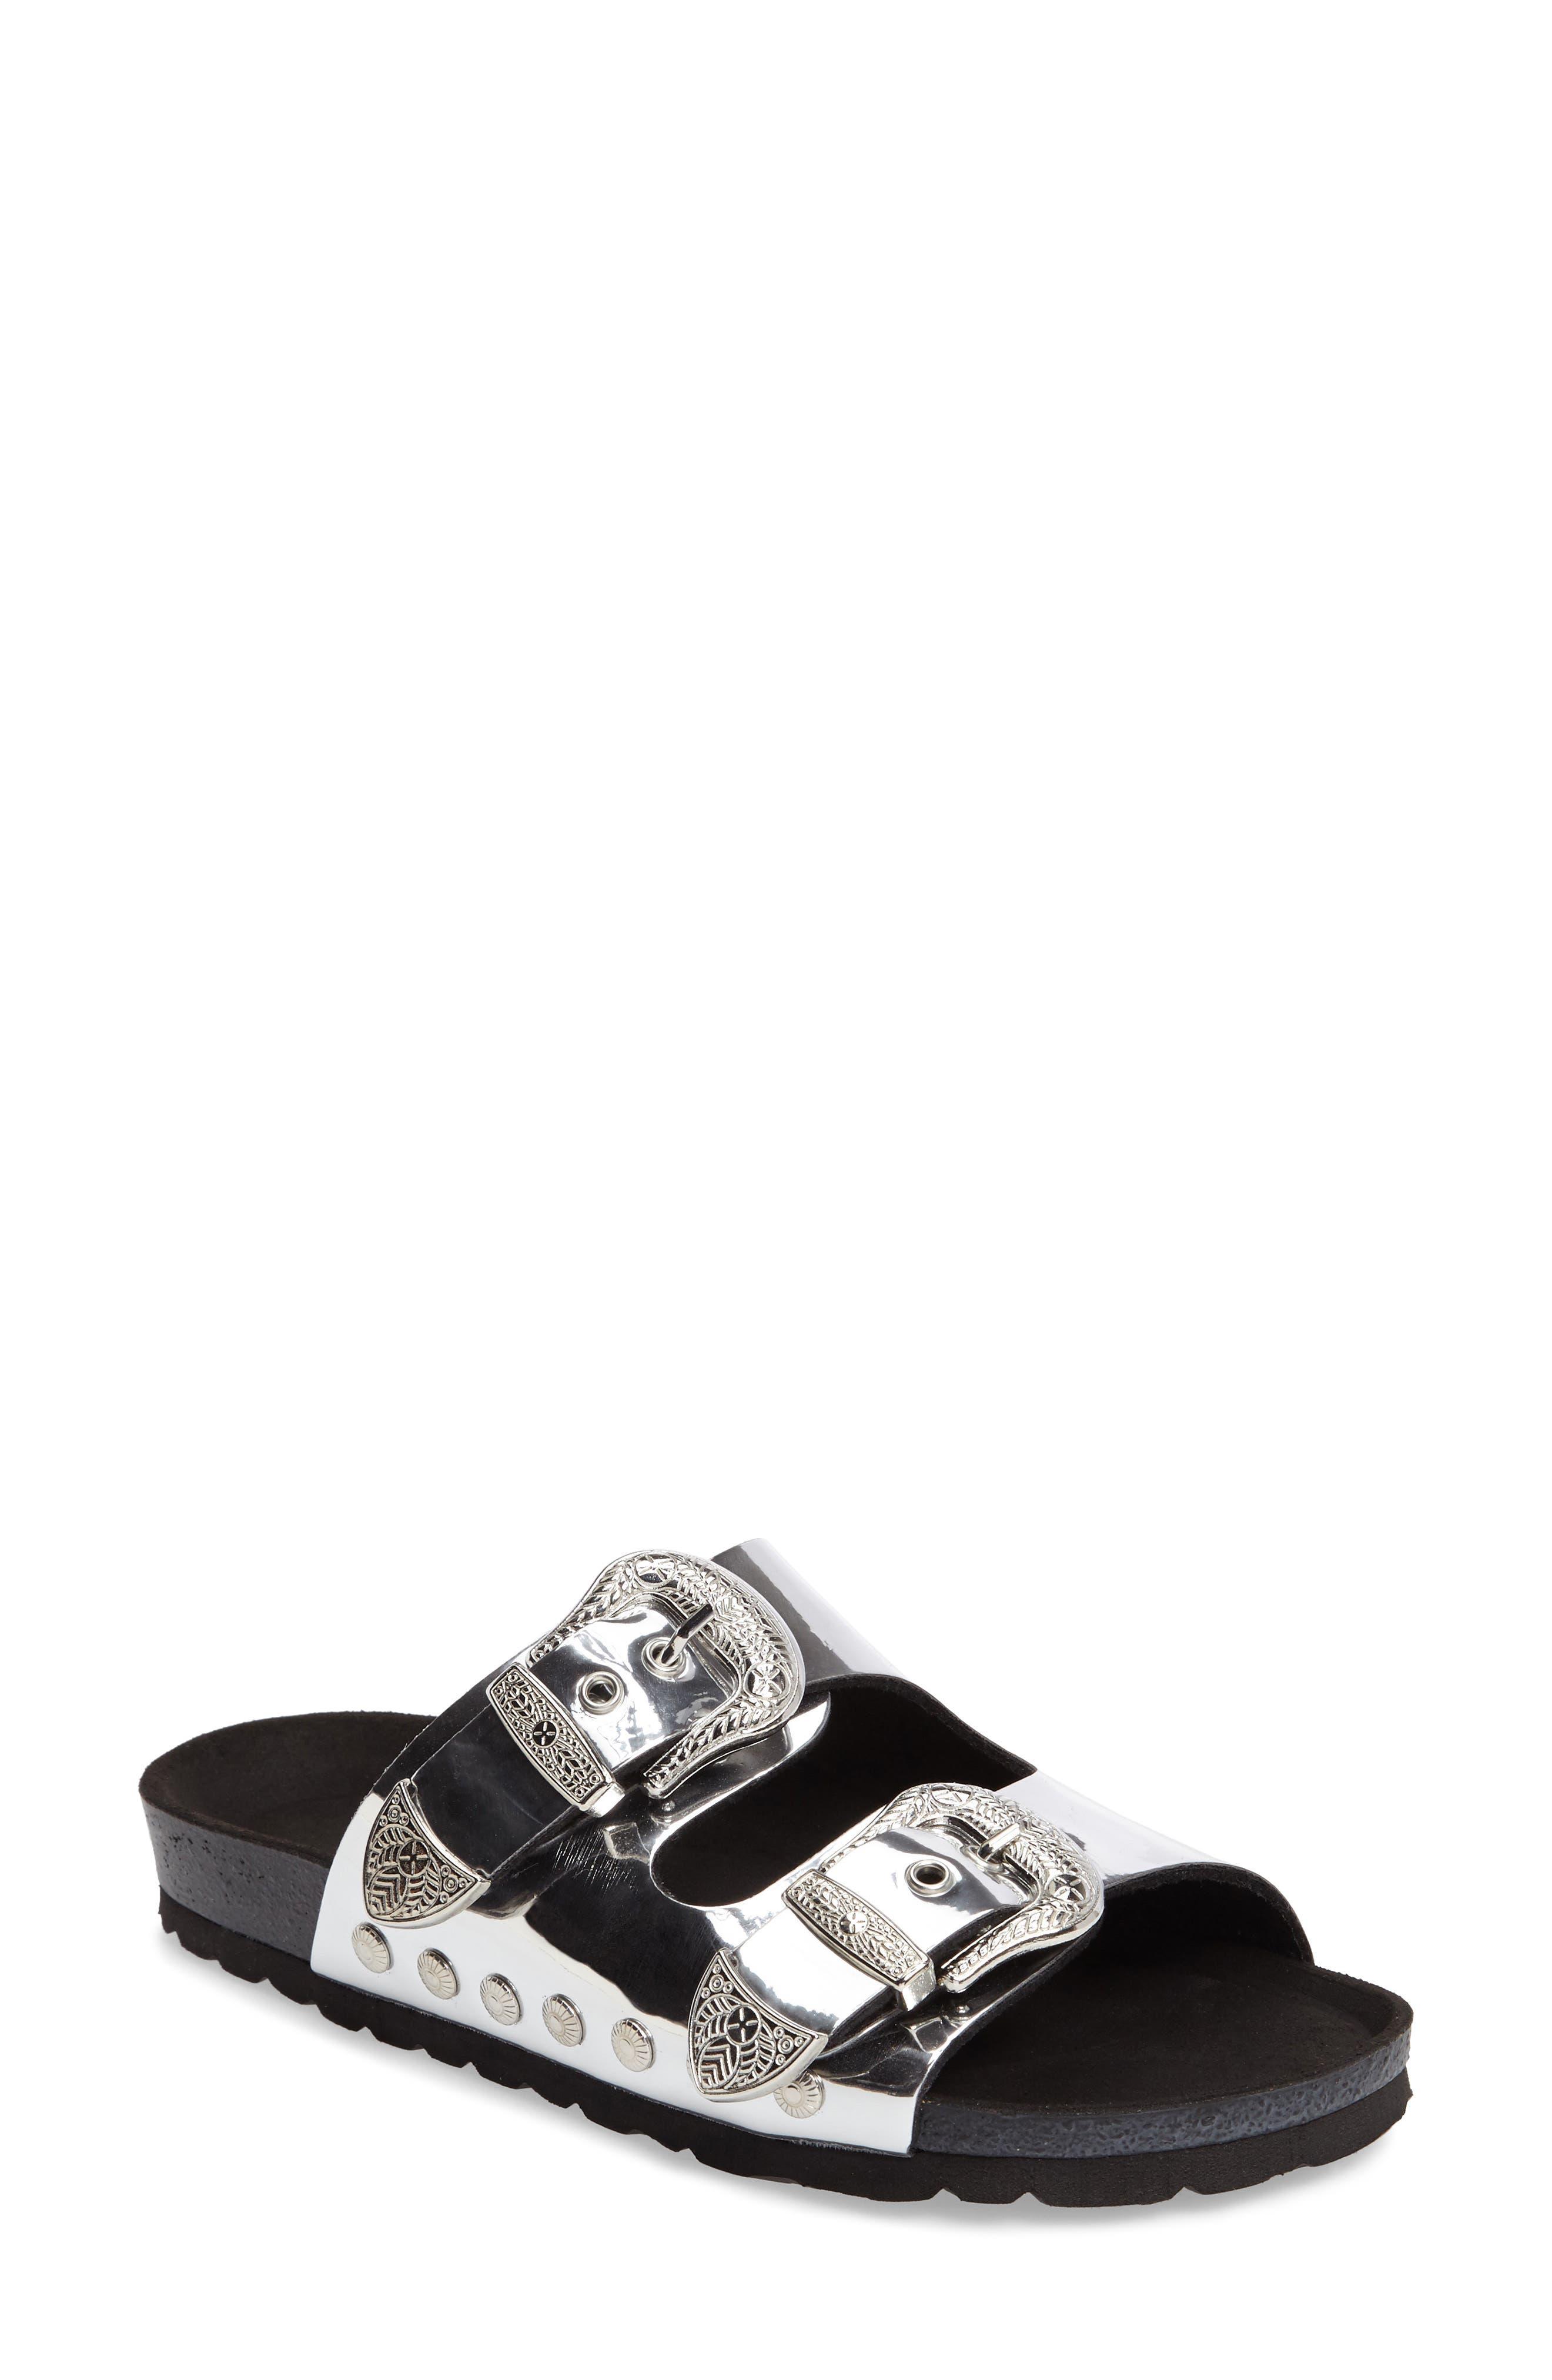 Alternate Image 1 Selected - Topshop Studded Slide Sandal (Women)